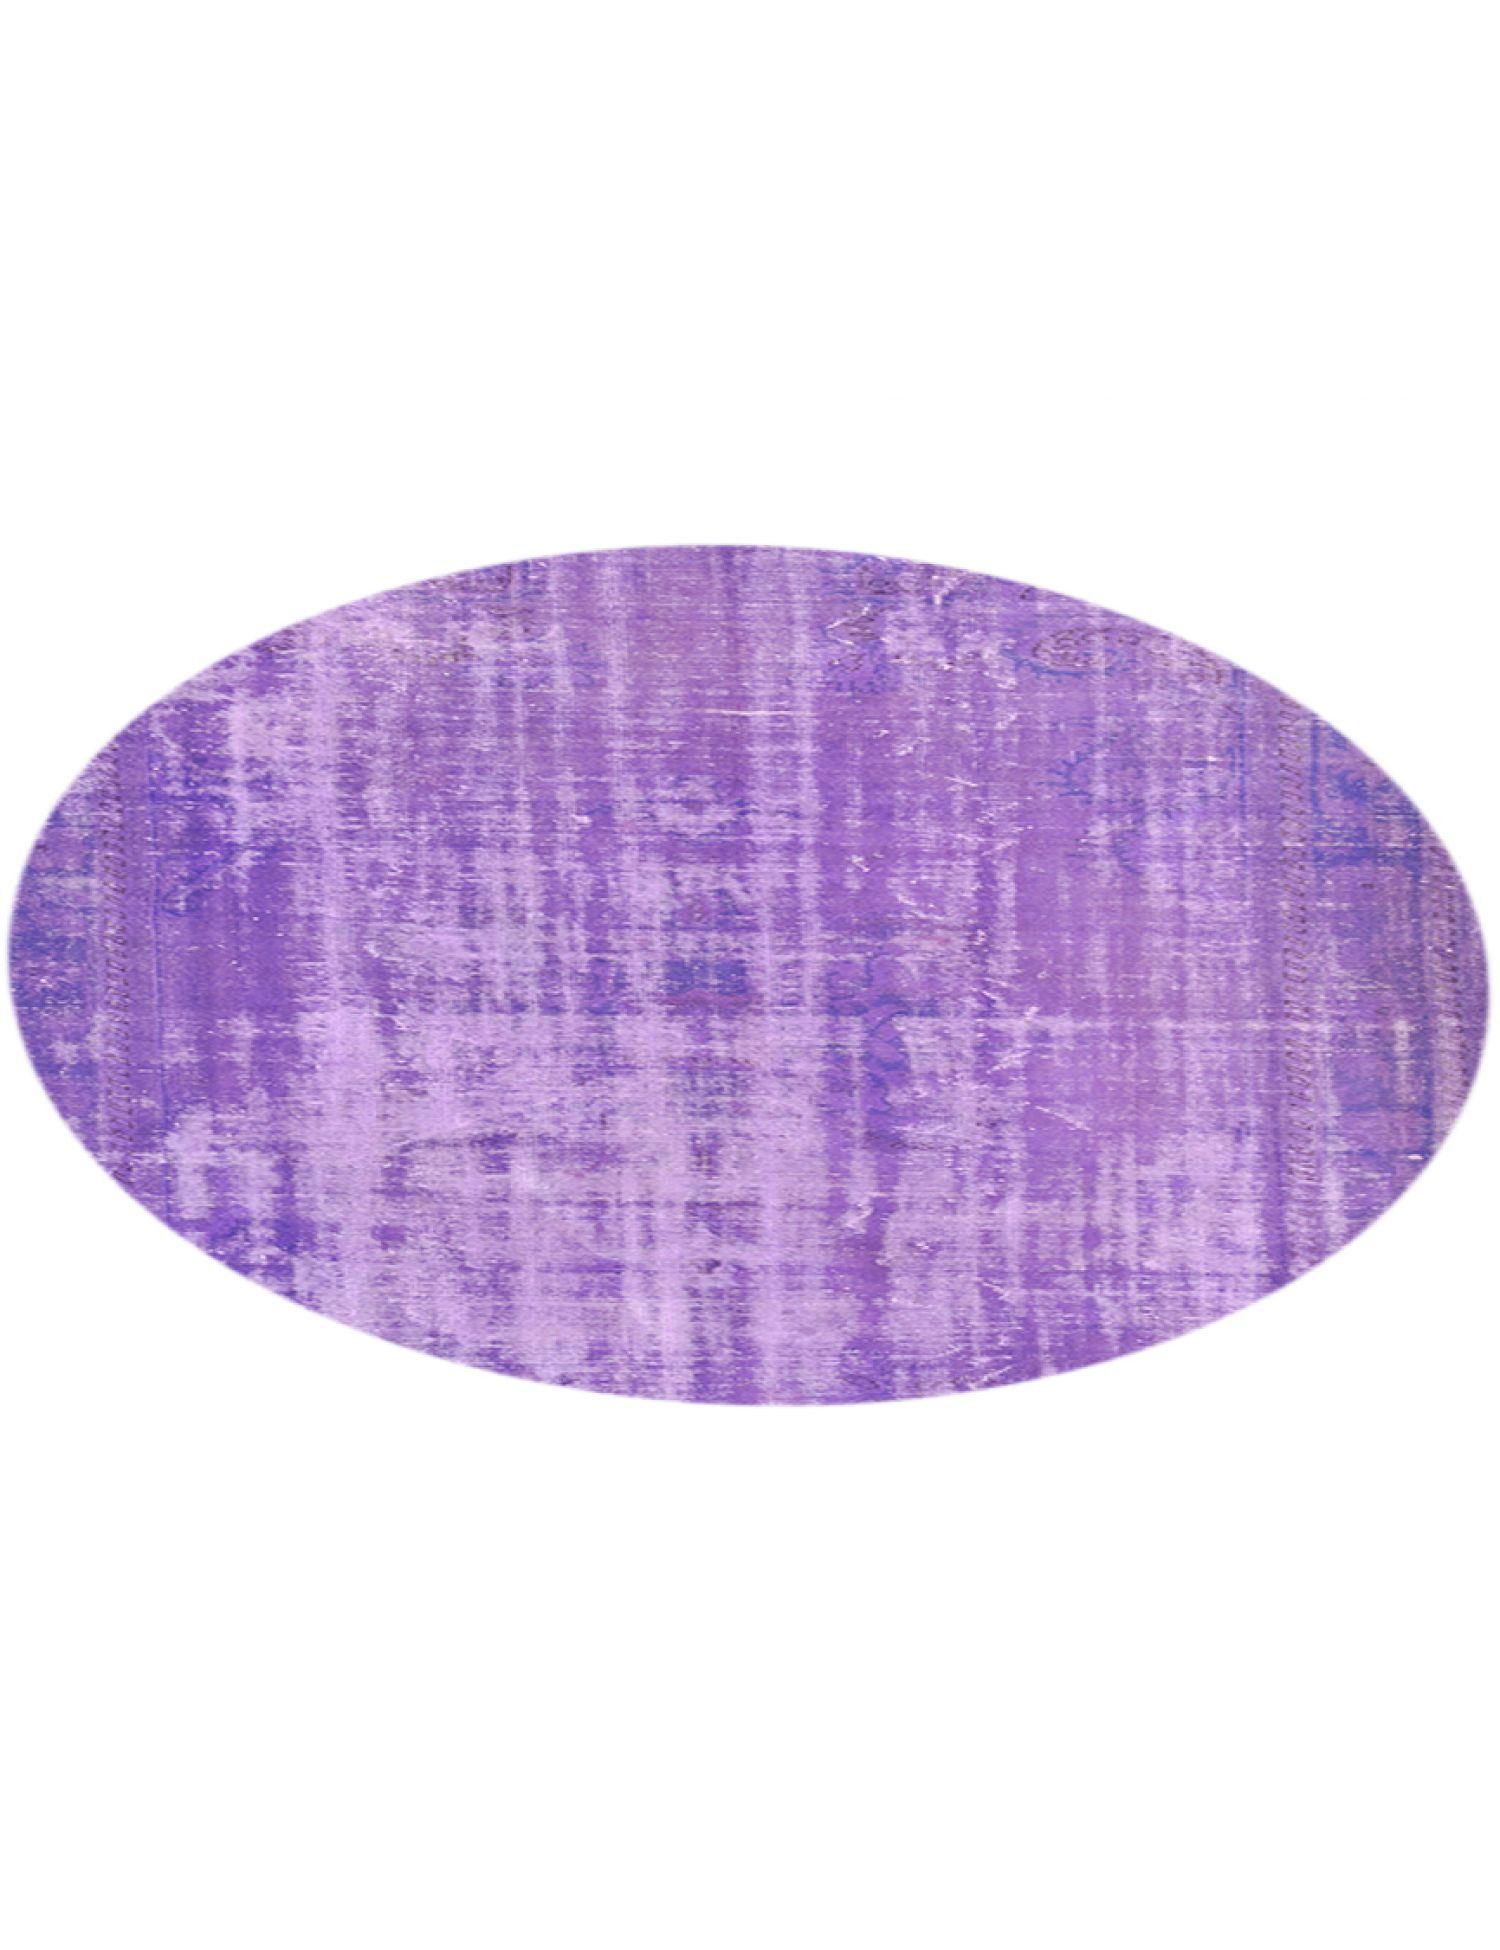 Tappeto Vintage  viola <br/>217 x 217 cm